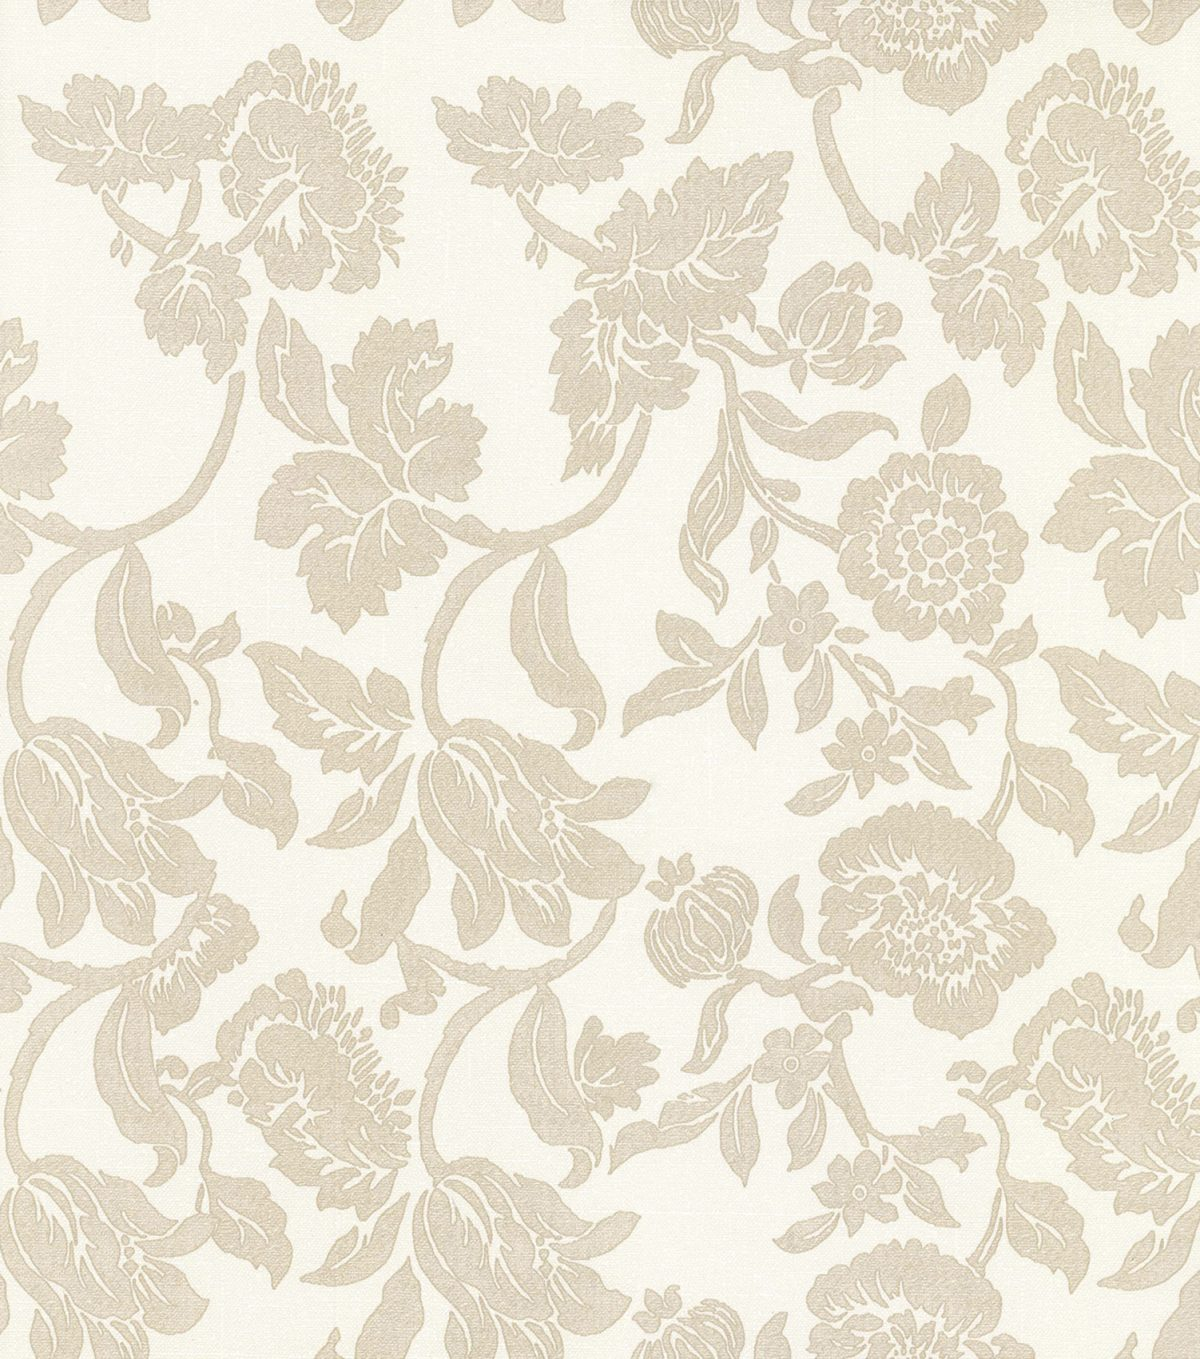 Papel de parede floral vinílico Harmonia